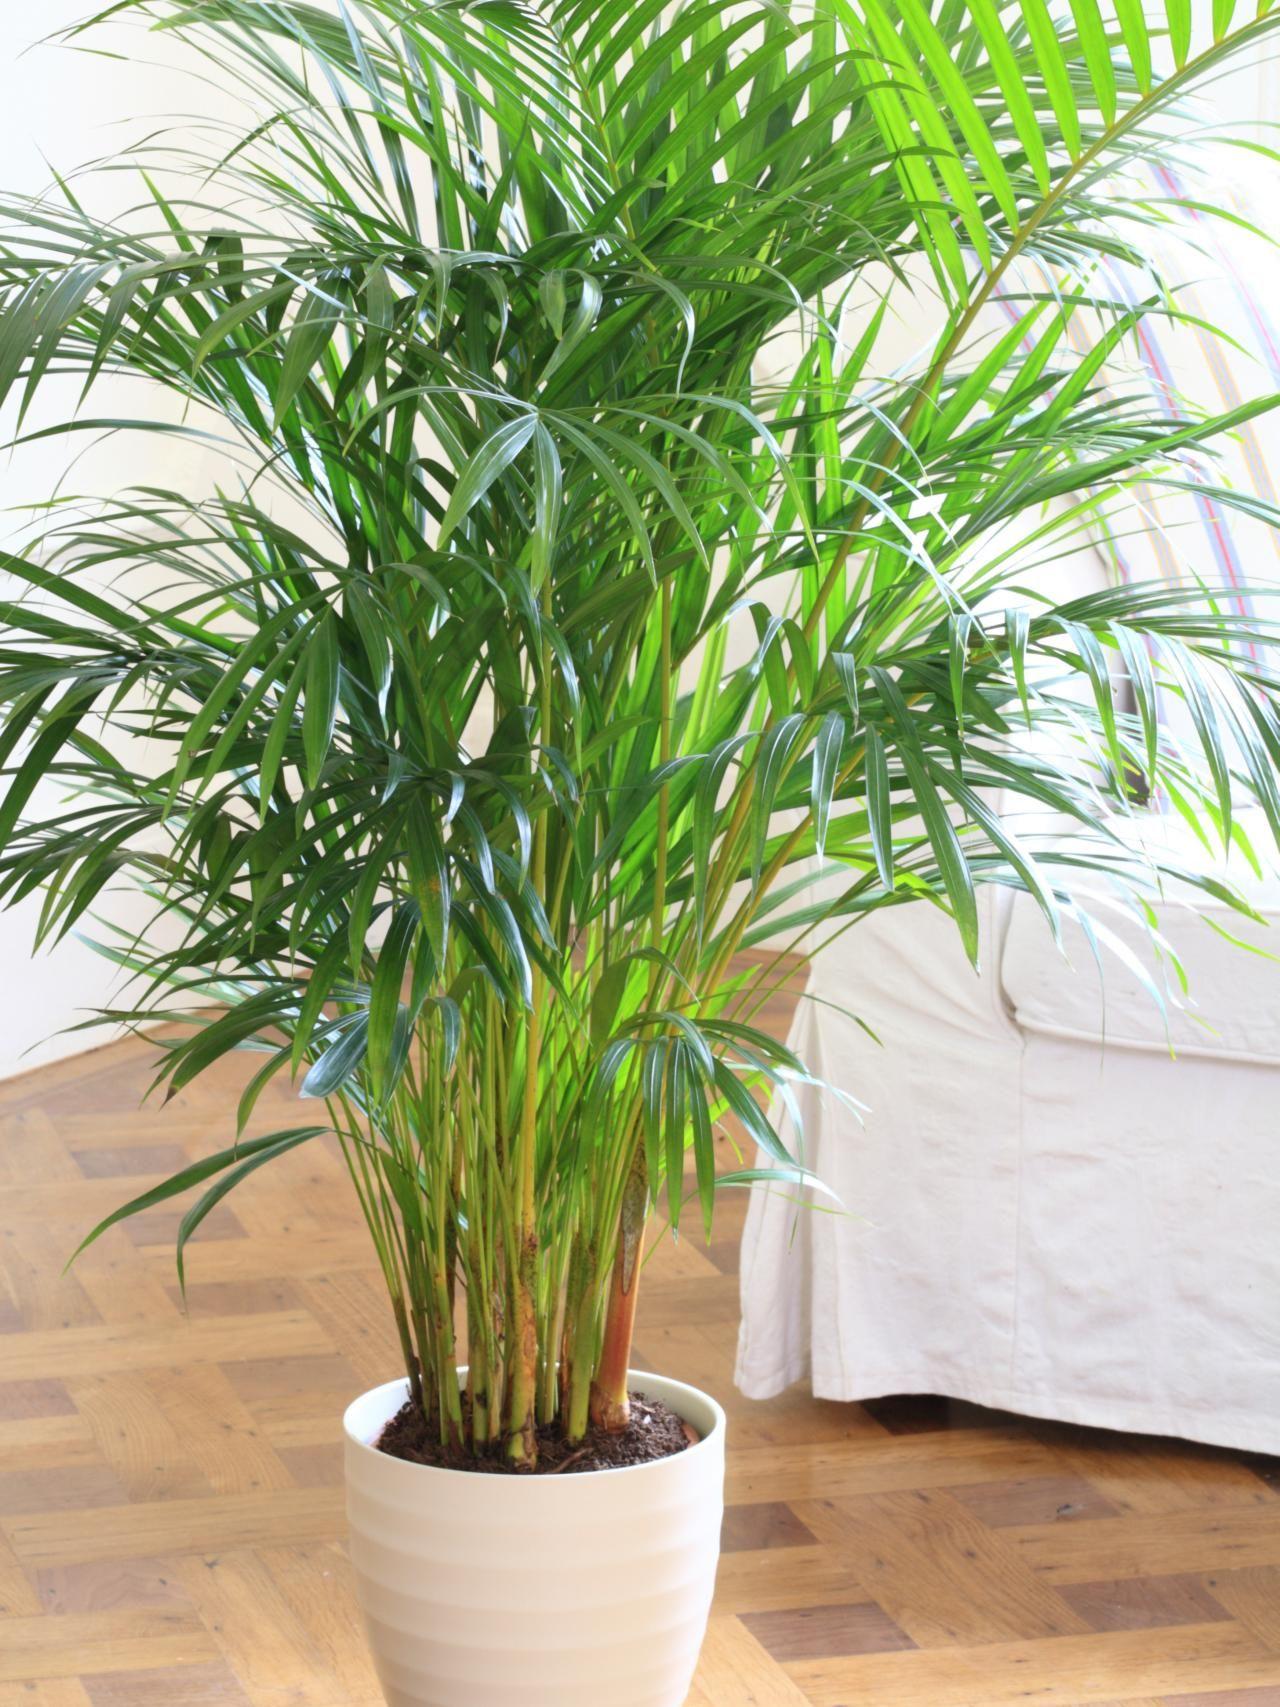 Shade Gardening Secrets Growing Plants Indoors Plants 400 x 300